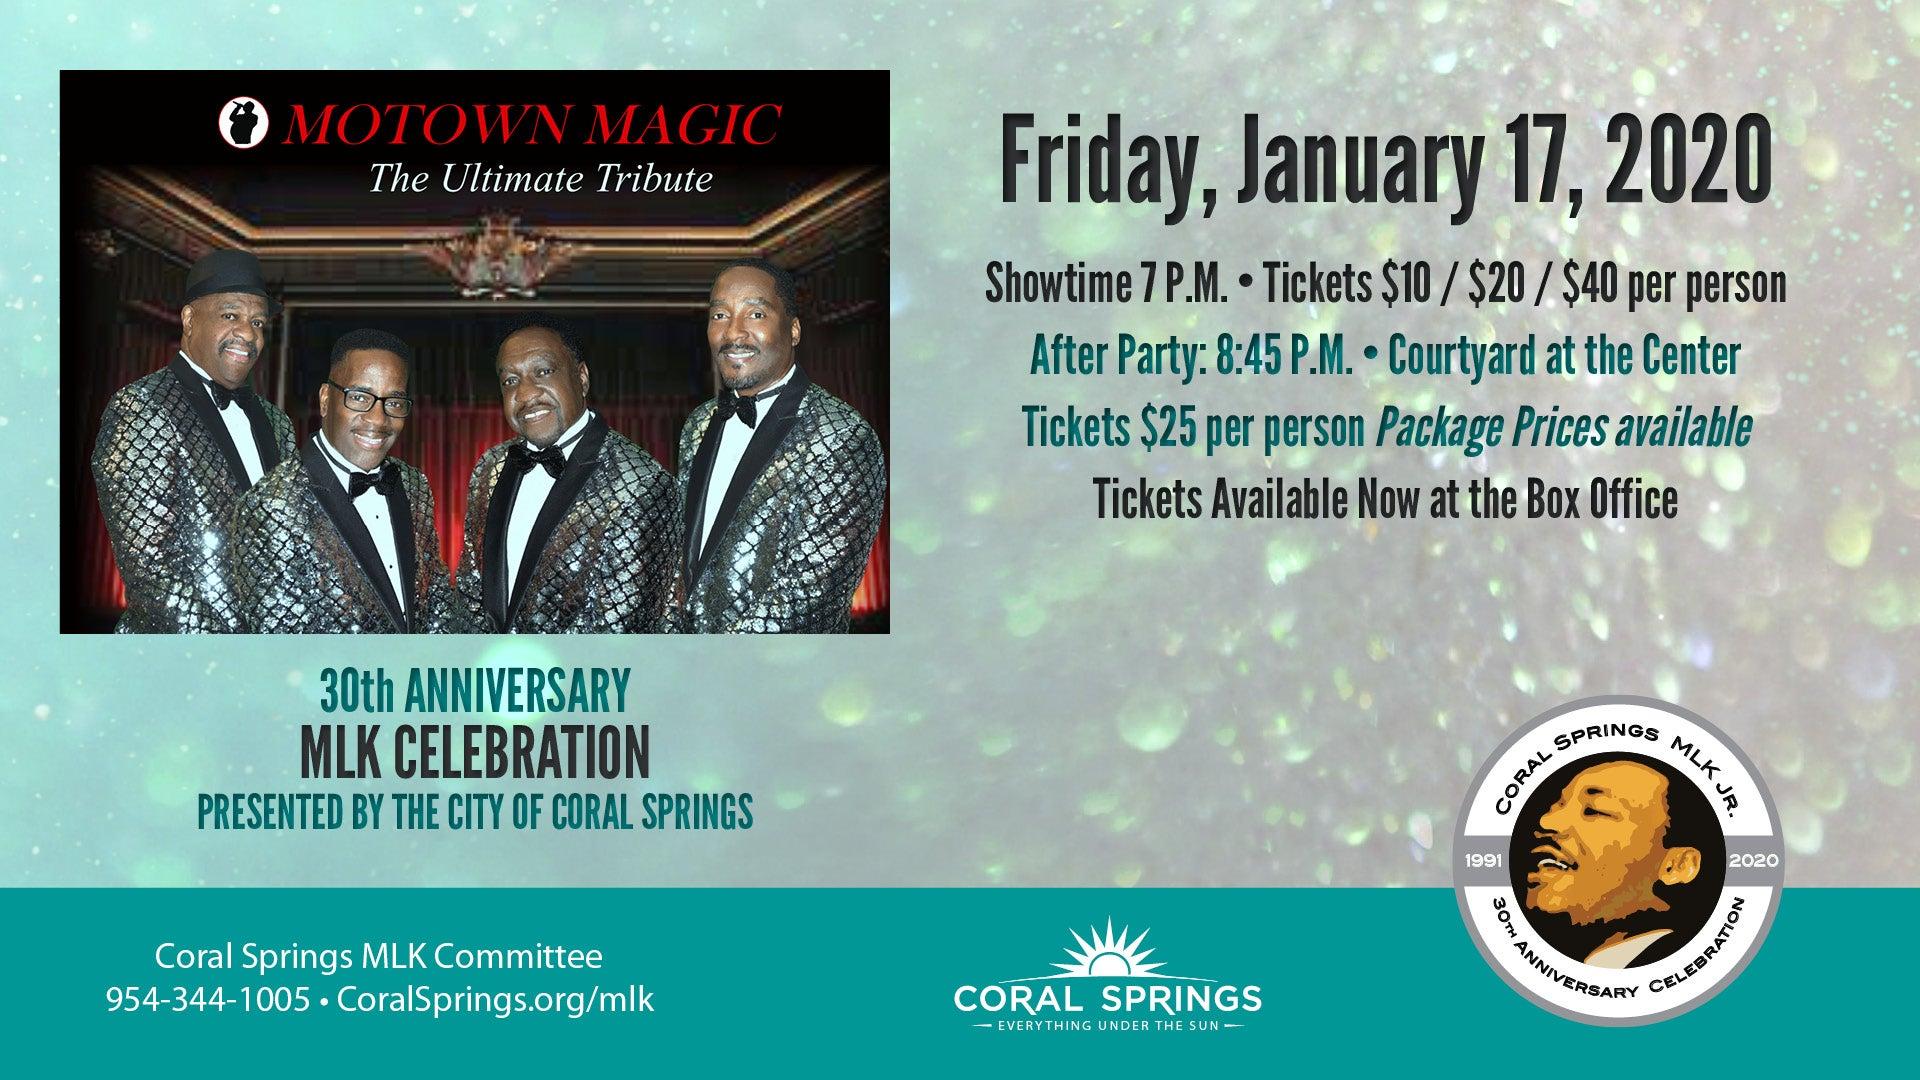 MLK Celebration: Motown Magic